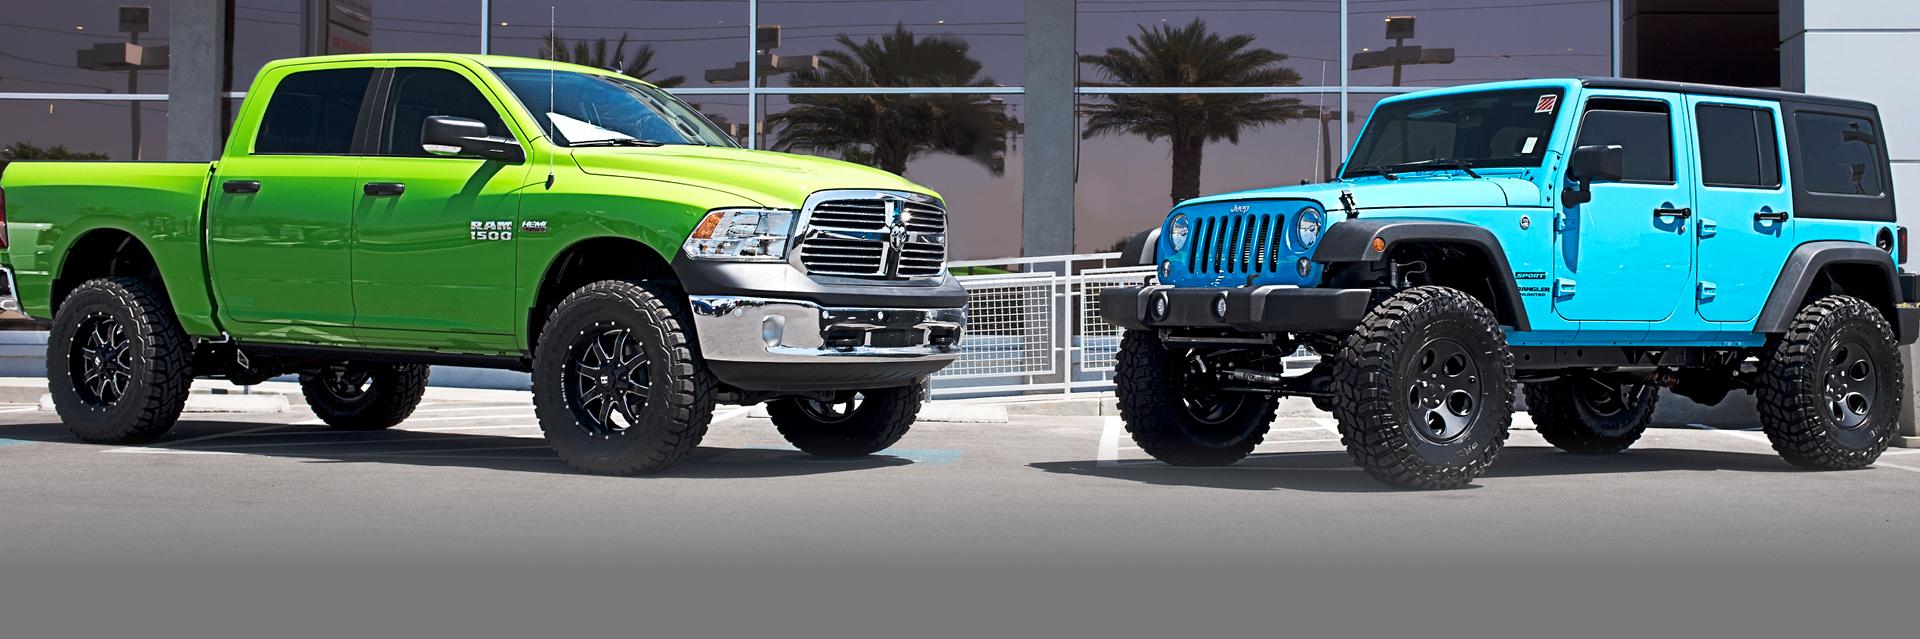 Sahara Chrysler Dodge Jeep Ram Truck Amp Car Dealers Las